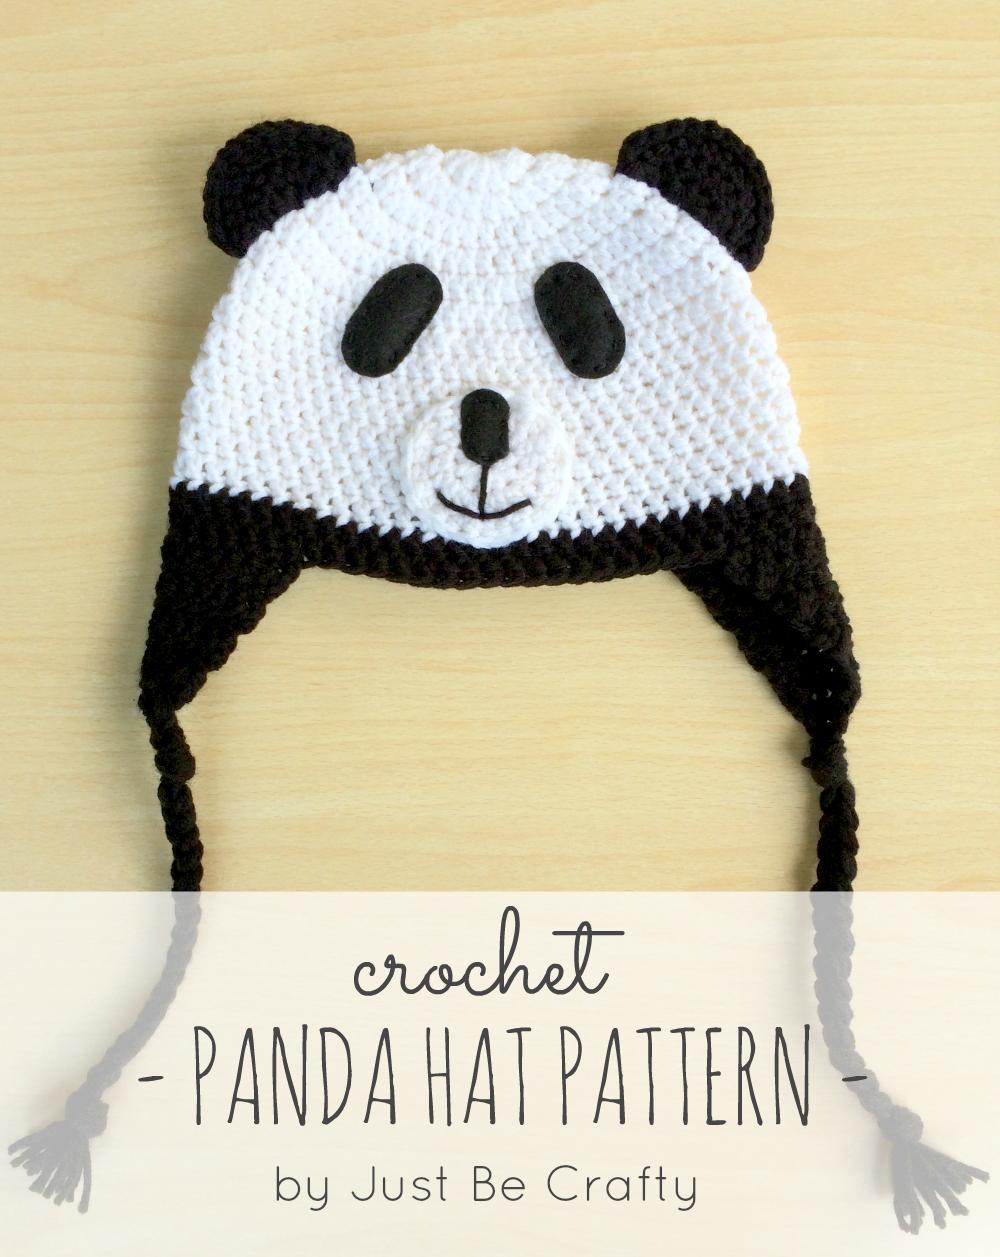 NEW PATTERN!! Crochet Panda Hat | Pinterest | Crochet panda, Panda ...